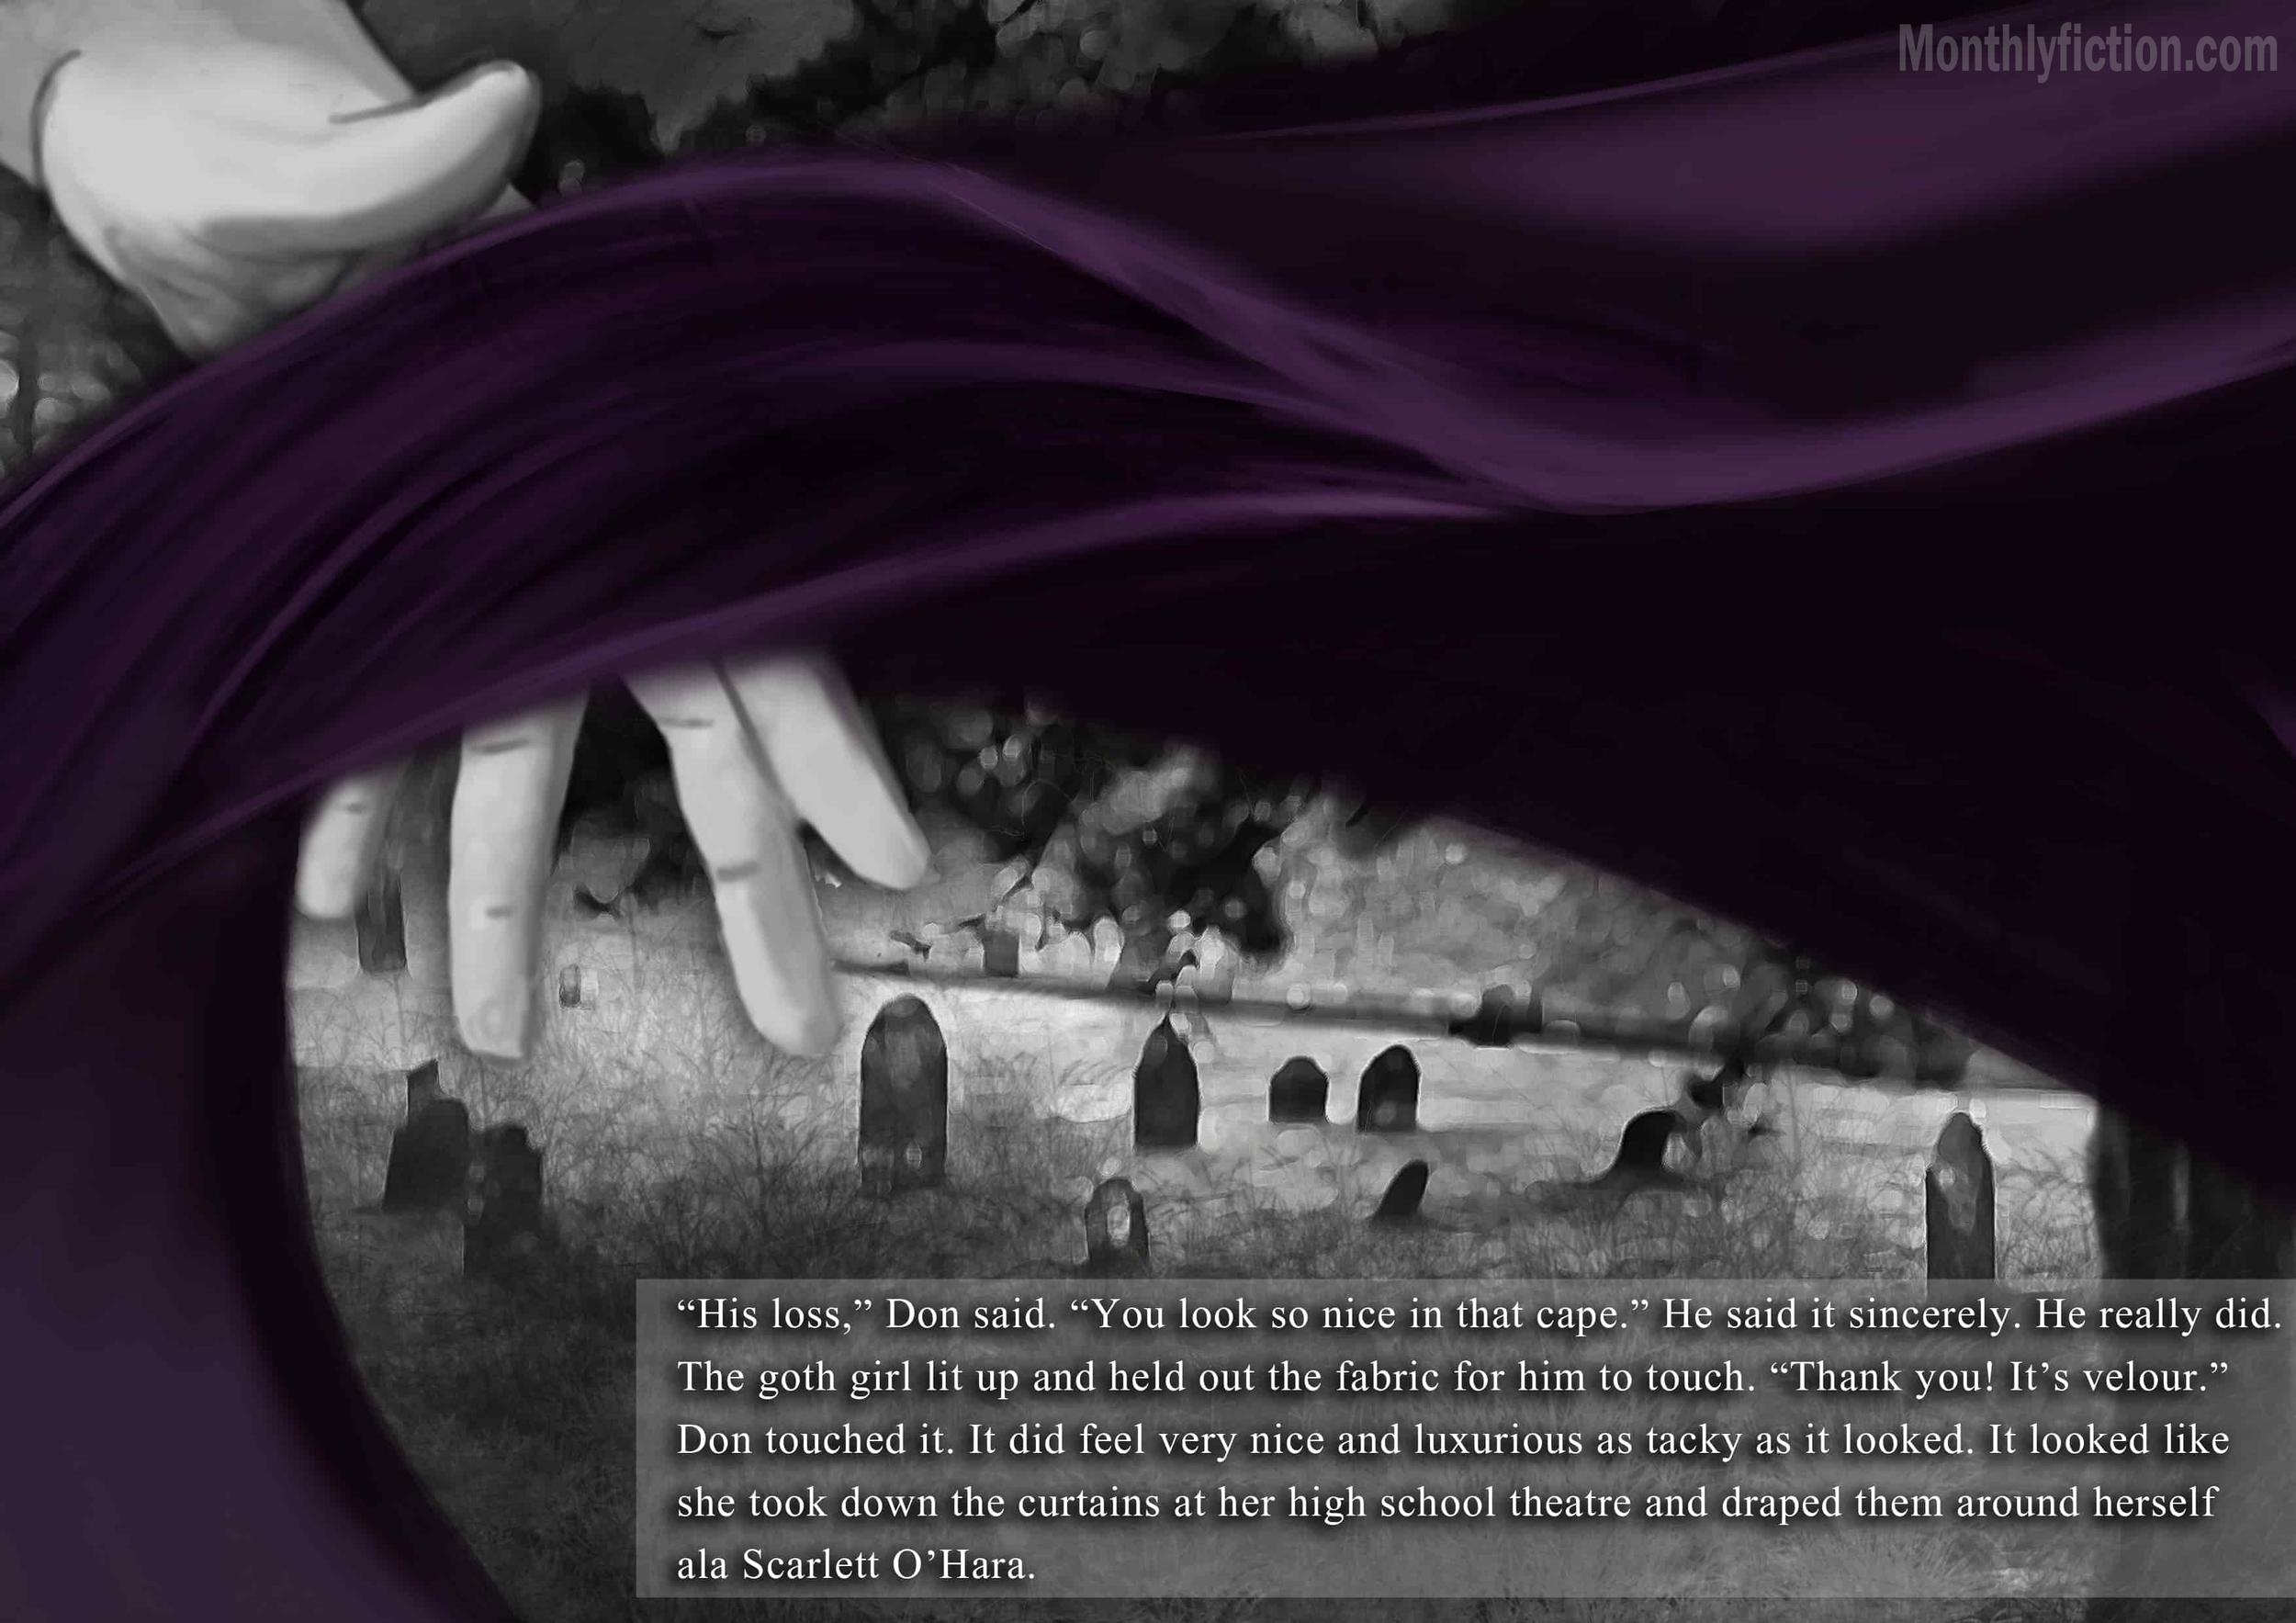 Monthly Fiction Amethyst illustration illustraded story stephanie weber ida softic page 18